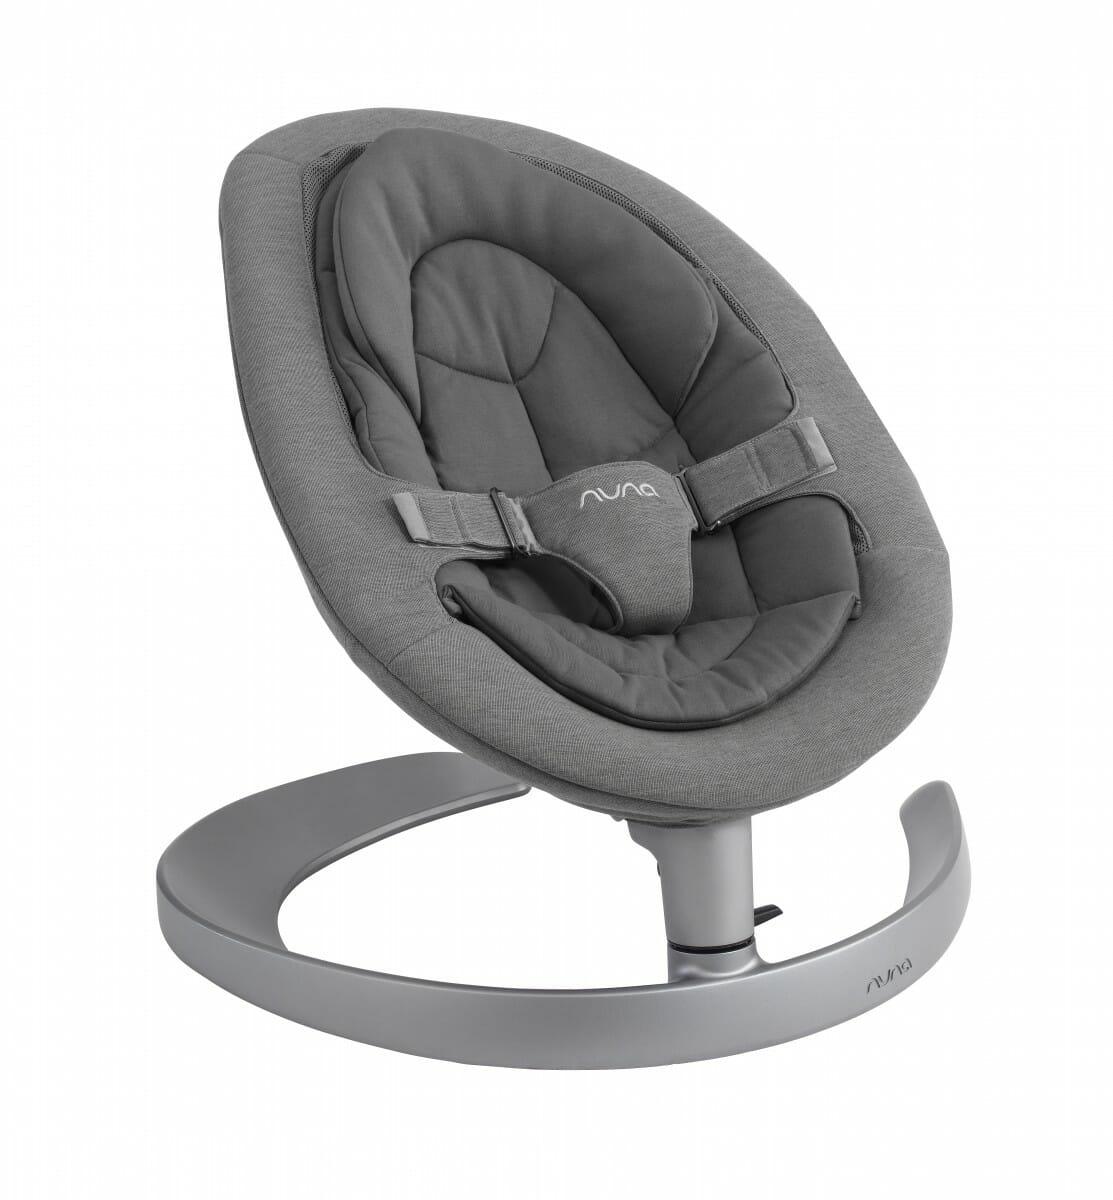 Nuna Leaf Grow Granite Angle Infant seat